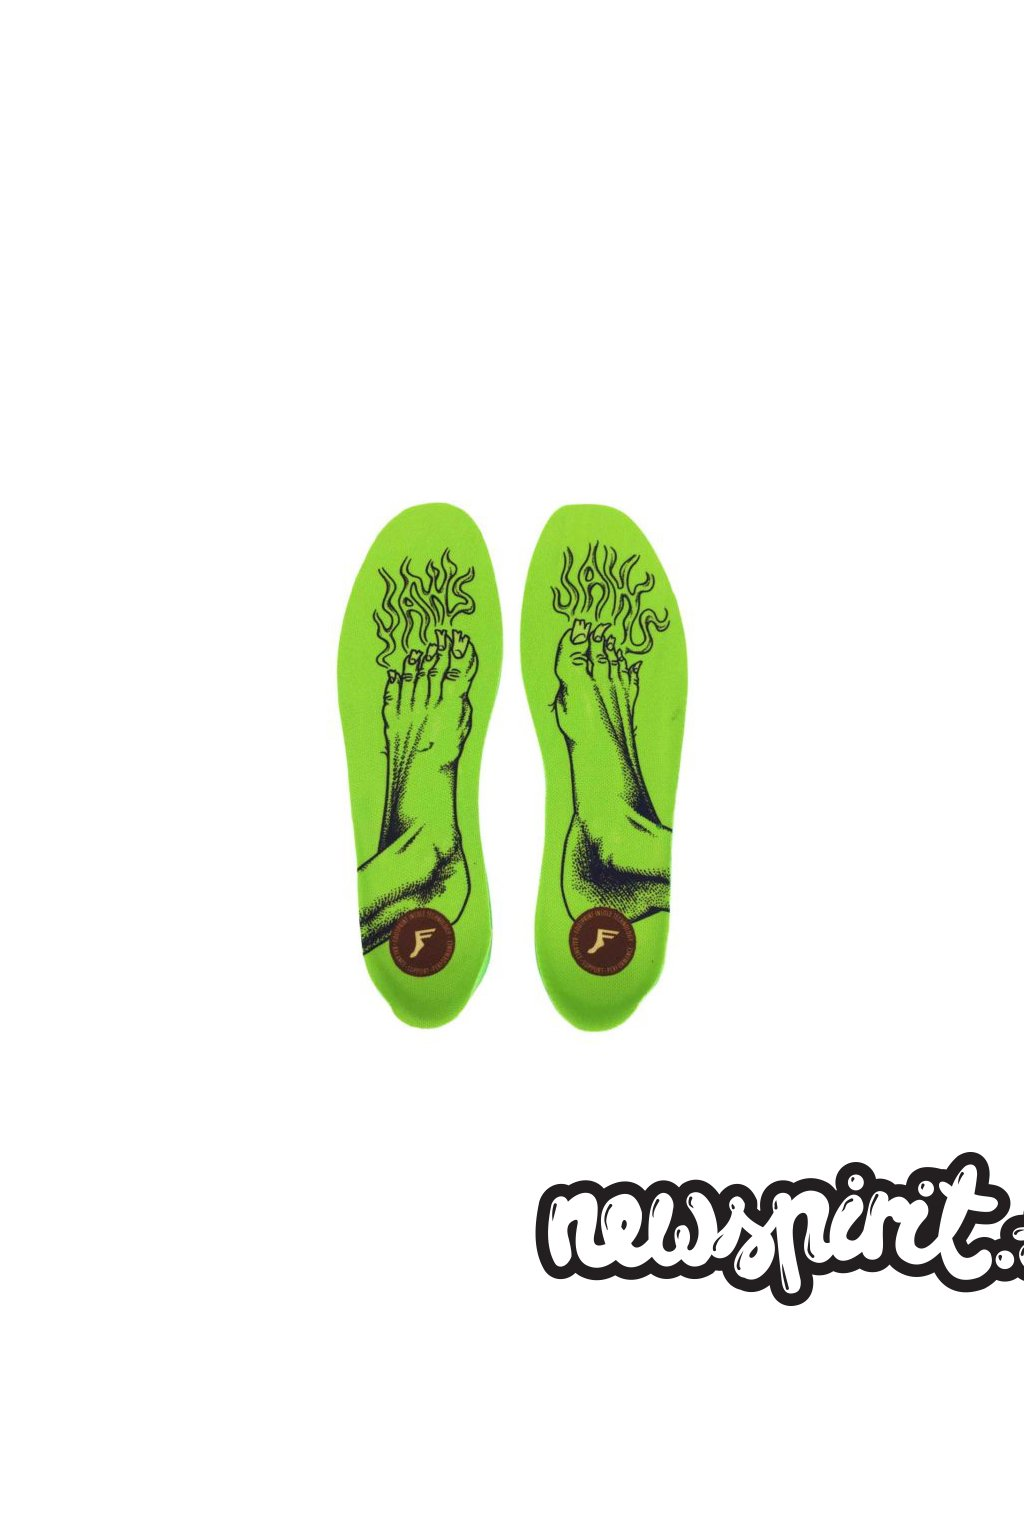 Elite Jaws Feet footprint 1